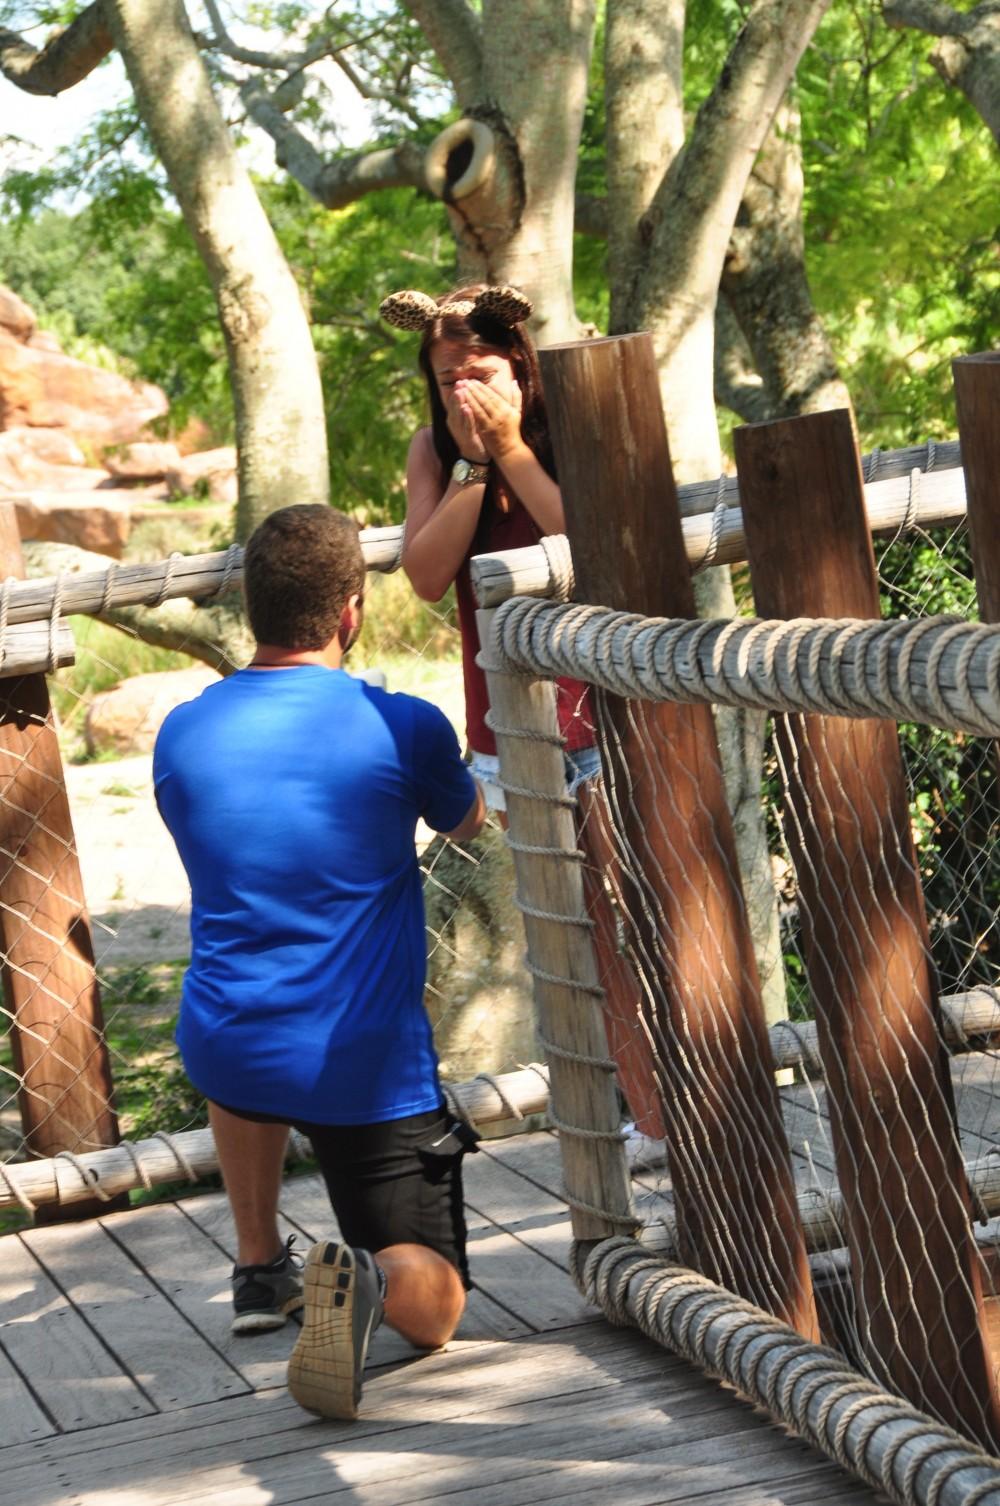 Image 1 of Tori and Blaine's Proposal at Animal Kingdom